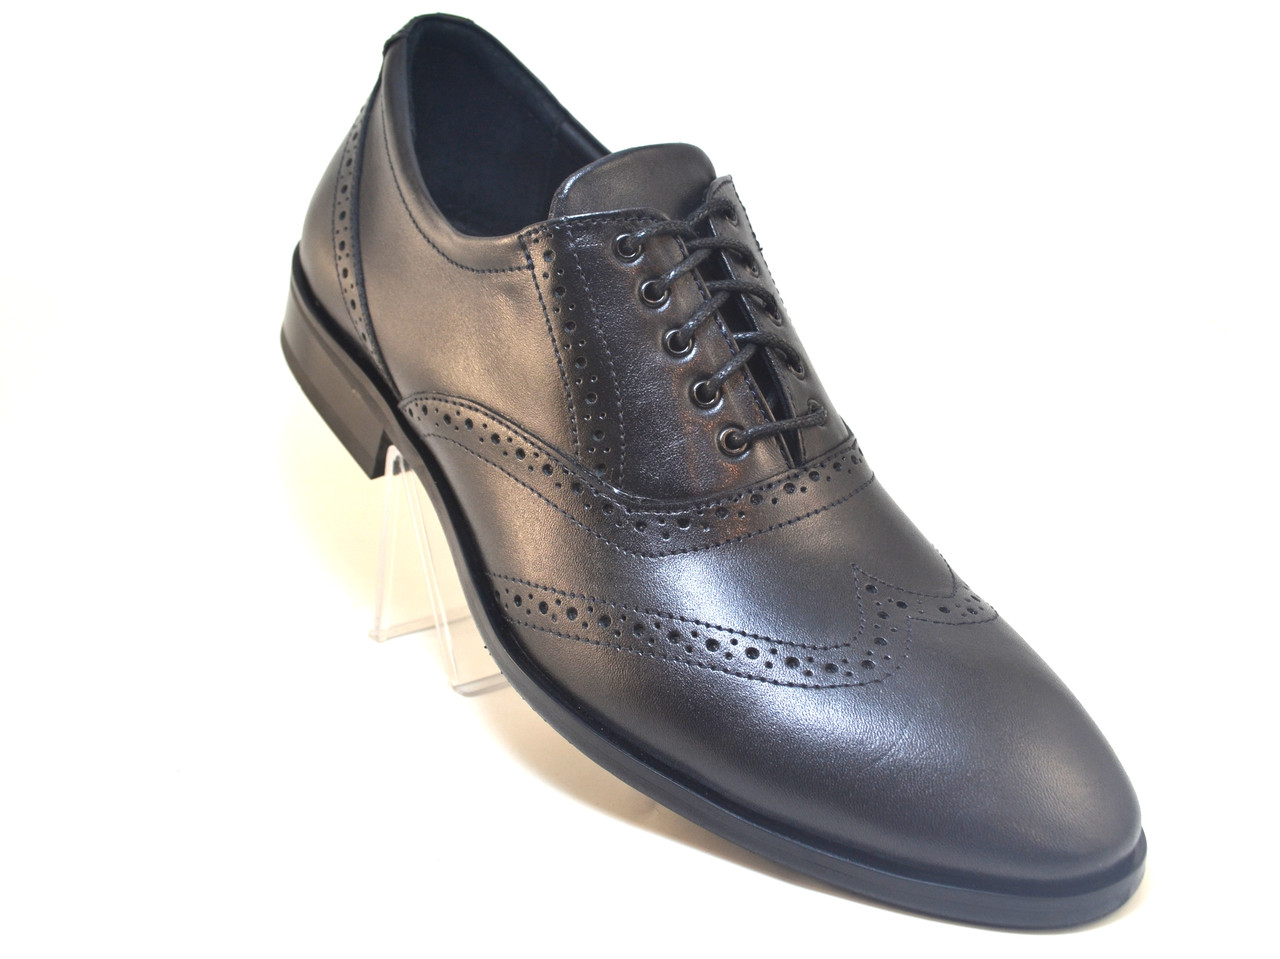 мужские туфли на каблуке фото